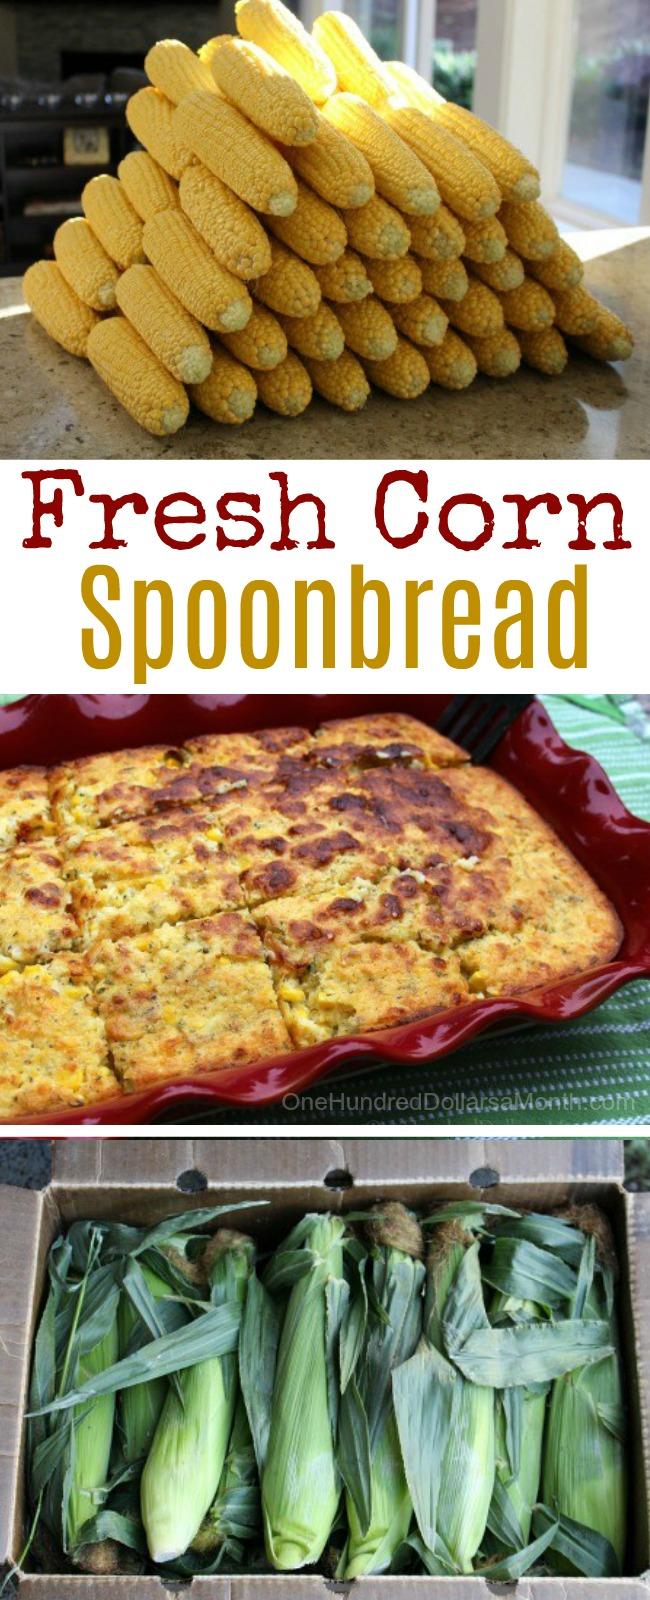 Fresh Corn Spoonbread